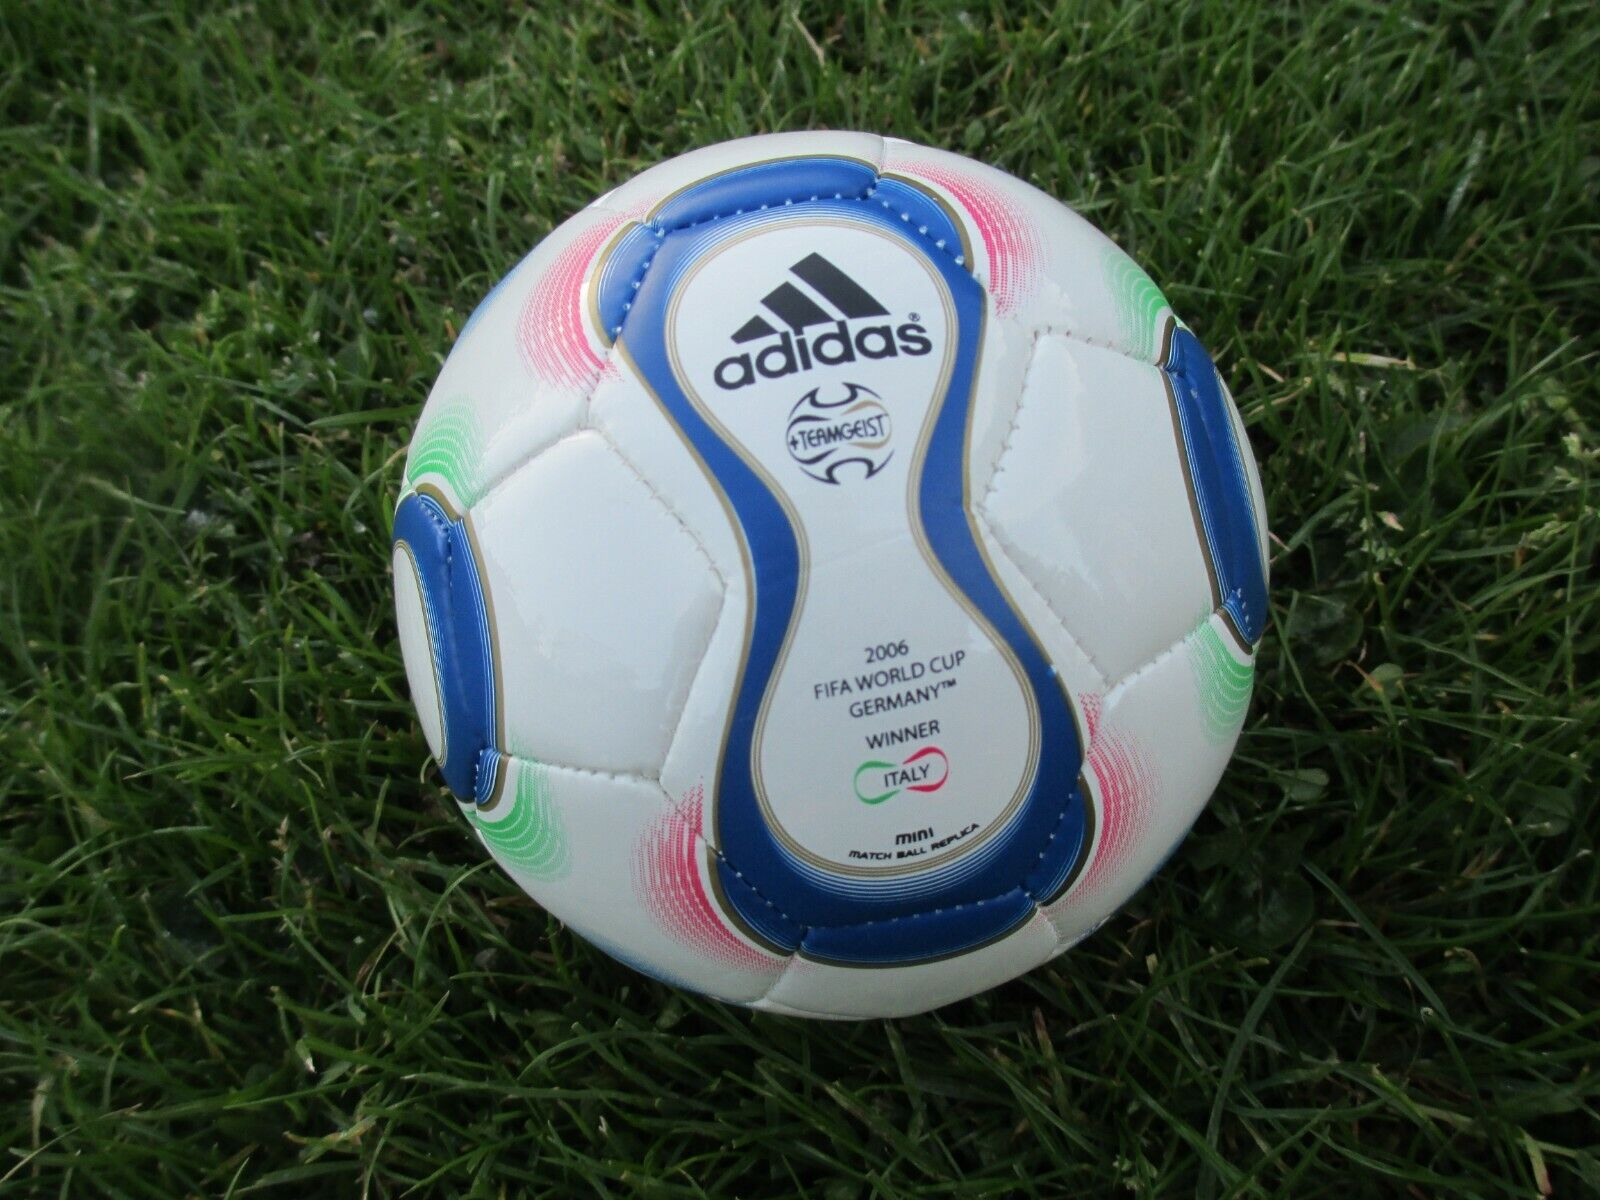 Adidas World Cup 2006 Teamgeist Größe 0 Official Mini Match Ball Replica Football